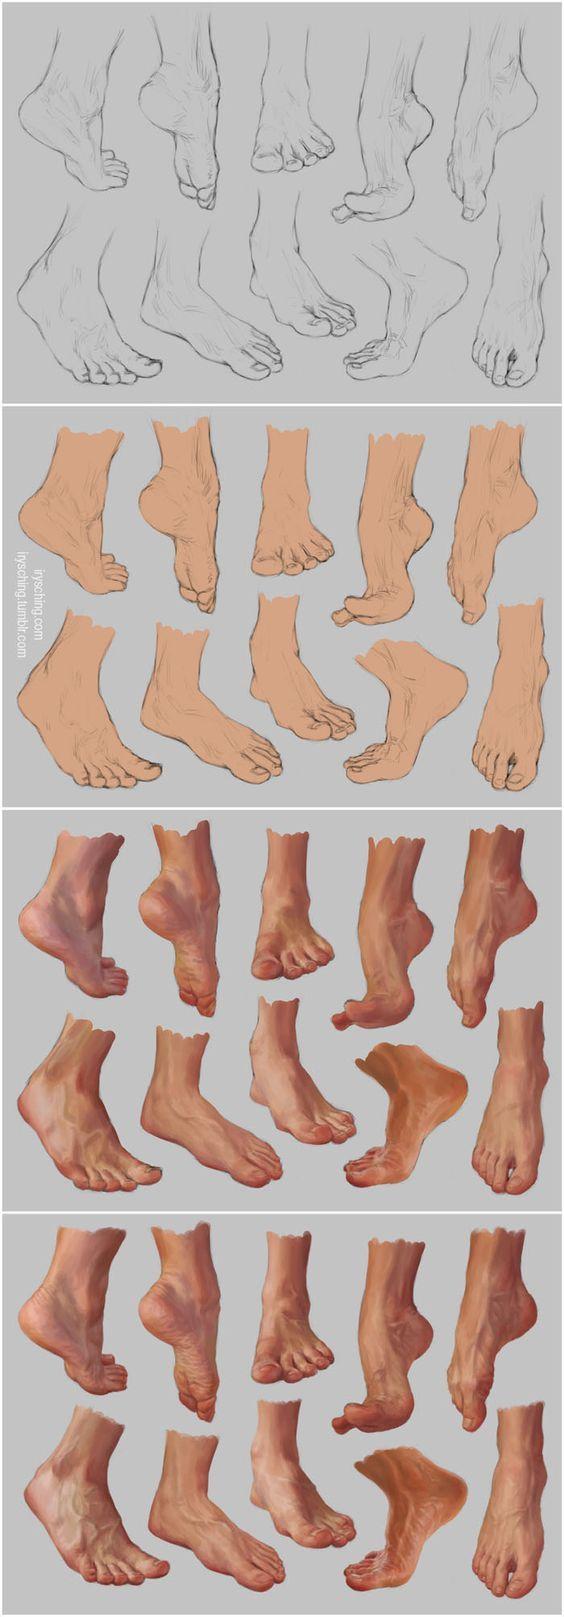 Drawing tutorials - Feet | Digital Painting Tutorials | Pinterest ...